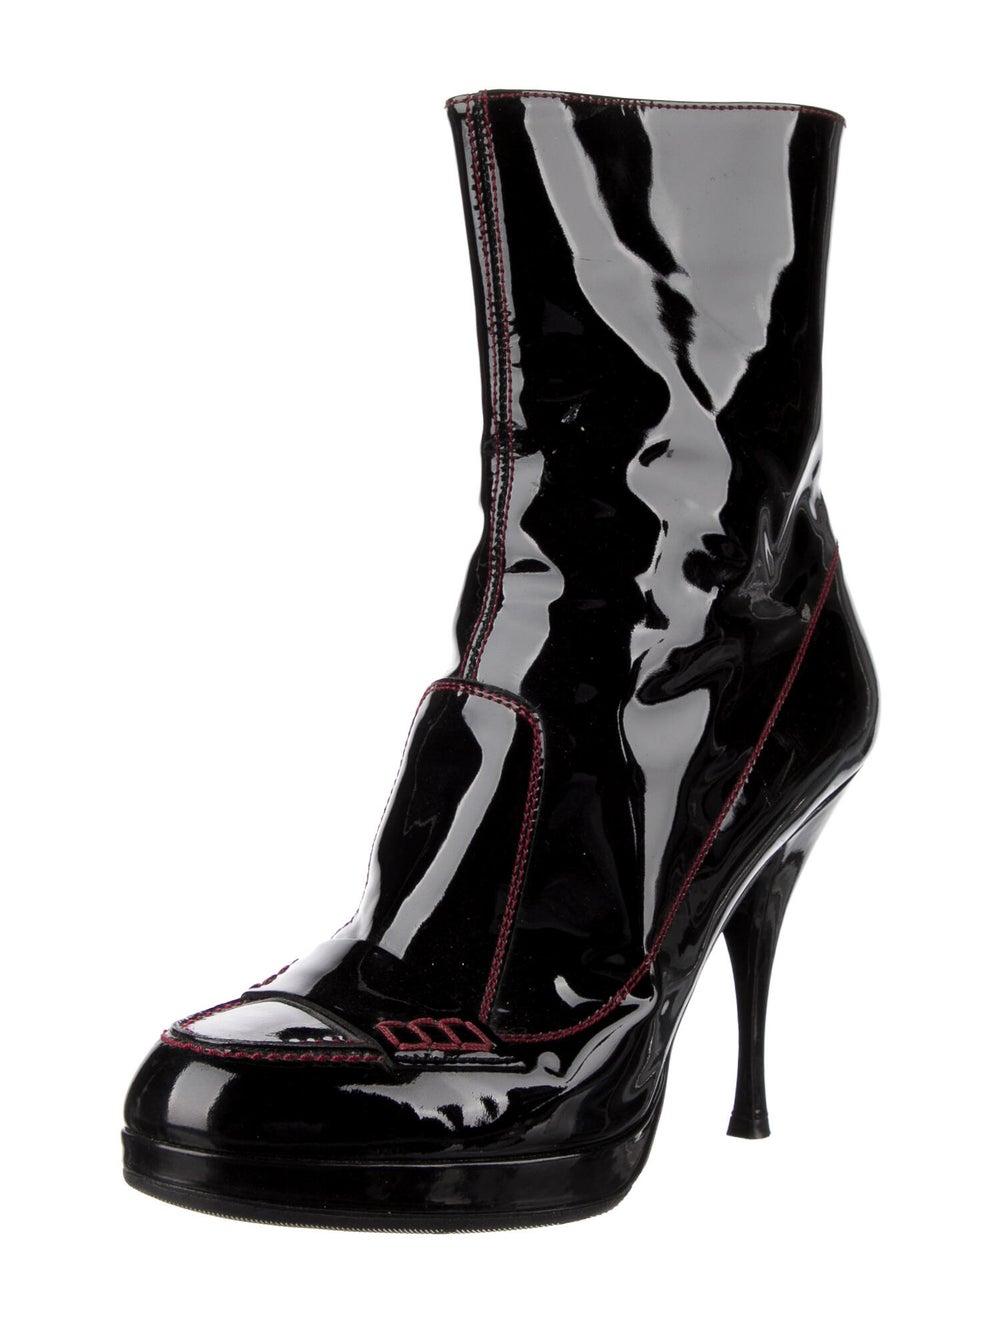 Yves Saint Laurent Rive Gauche Patent Leather Boo… - image 2